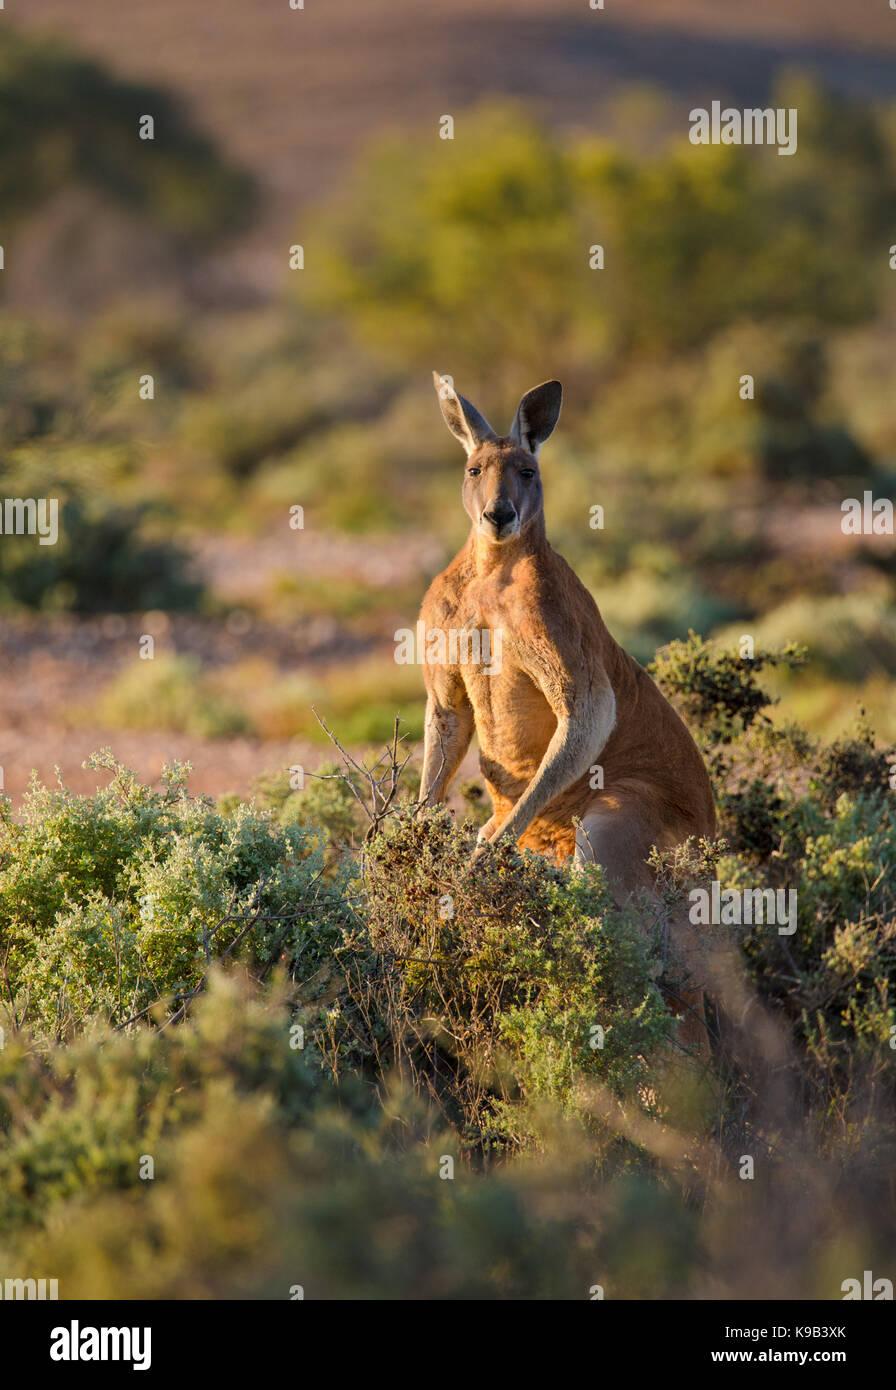 Male Red Kangaroo (Macropus rufus), Sturt National Park, outback NSW, Australia - Stock Image